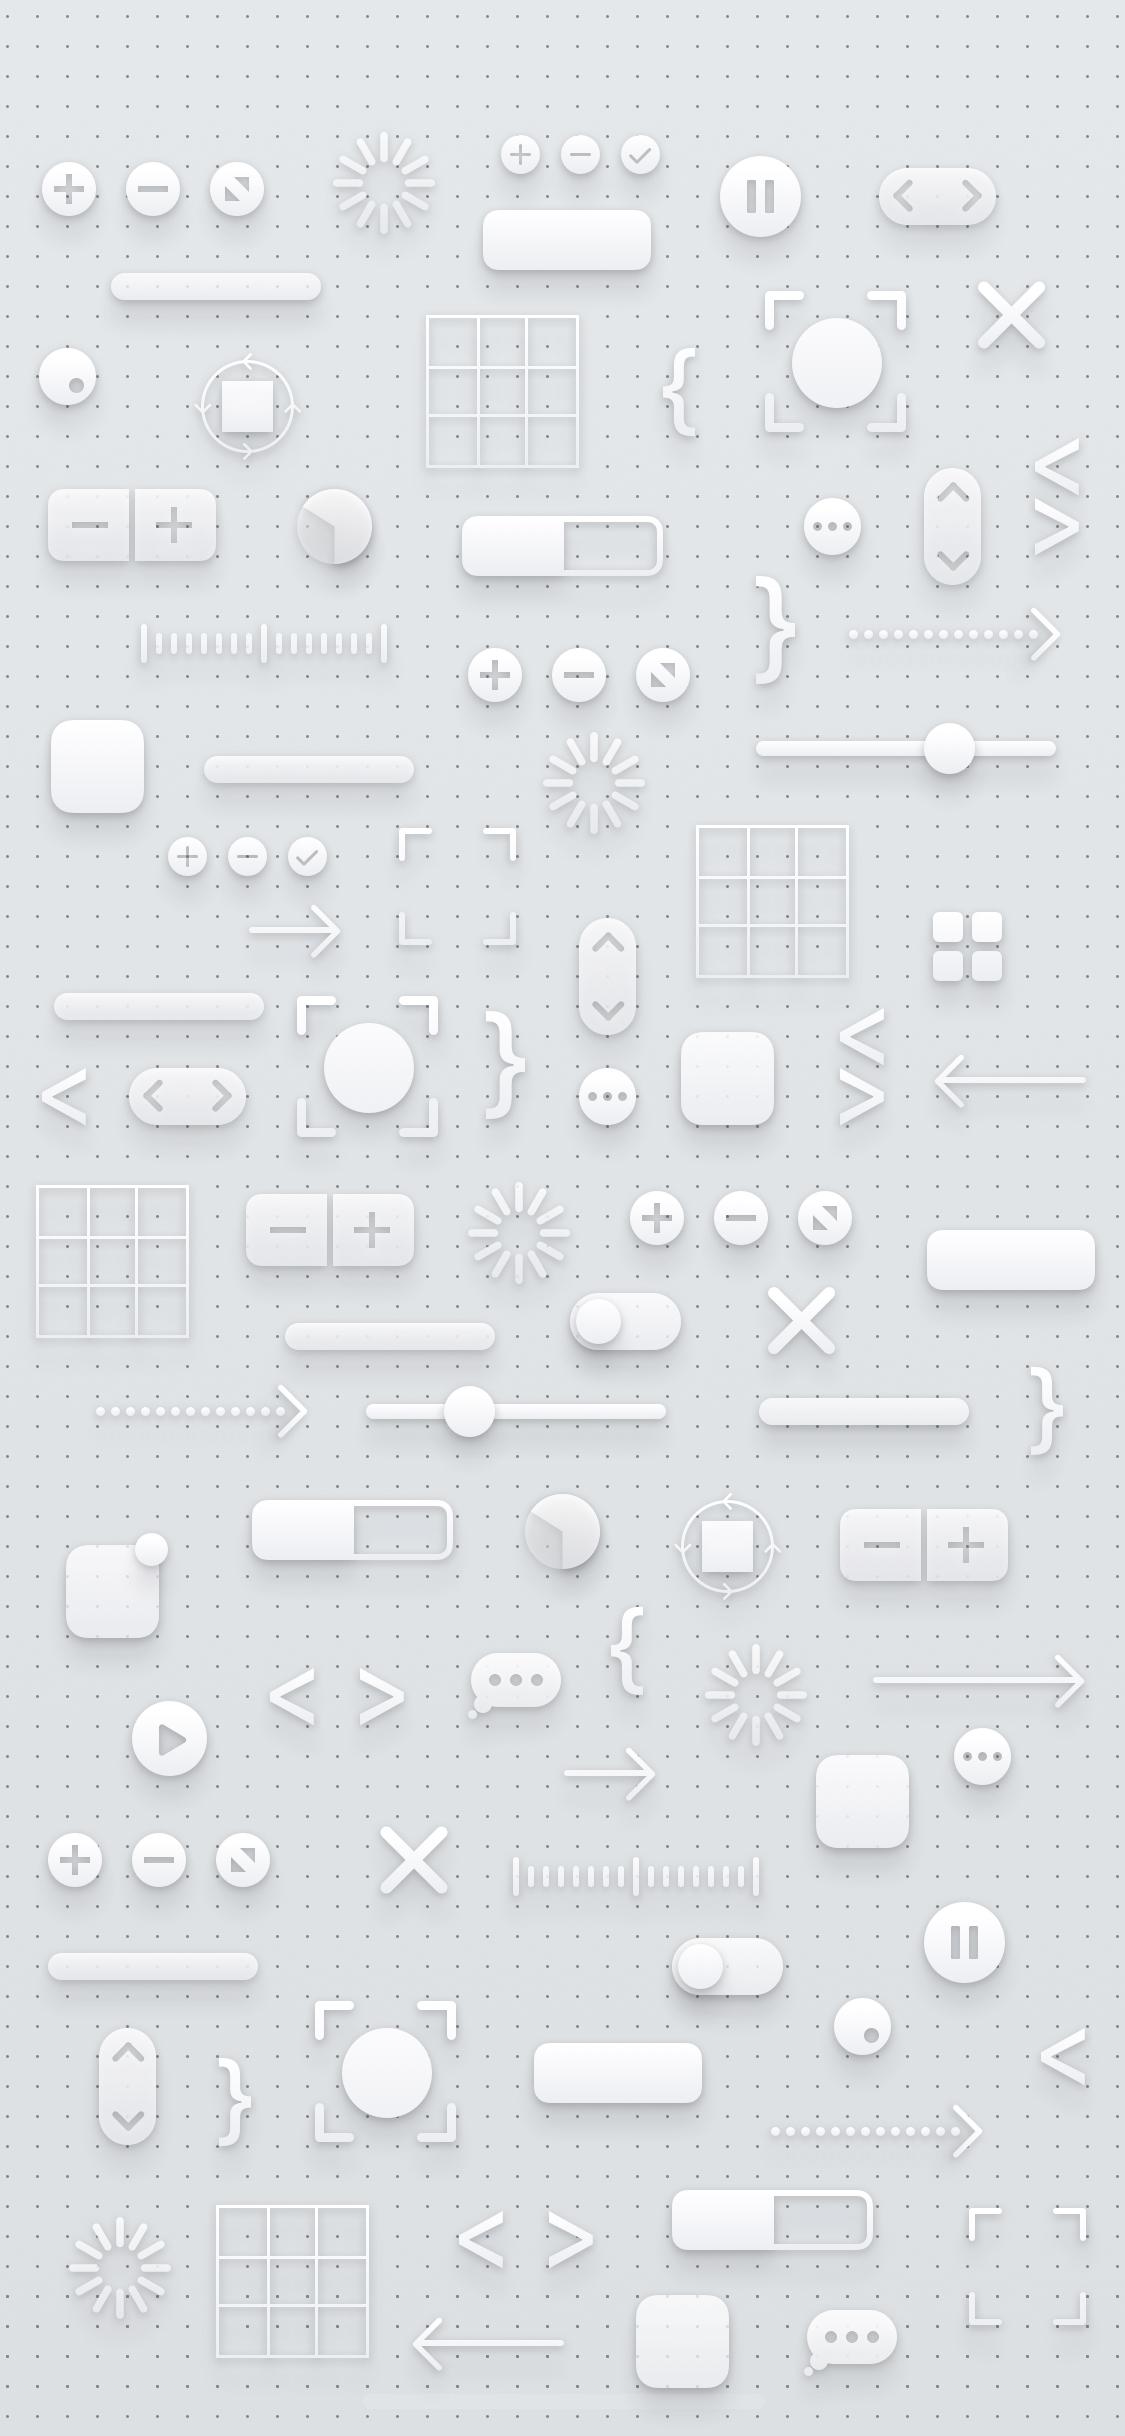 Wwdc 18デザインのiphone用壁紙が公開 It News